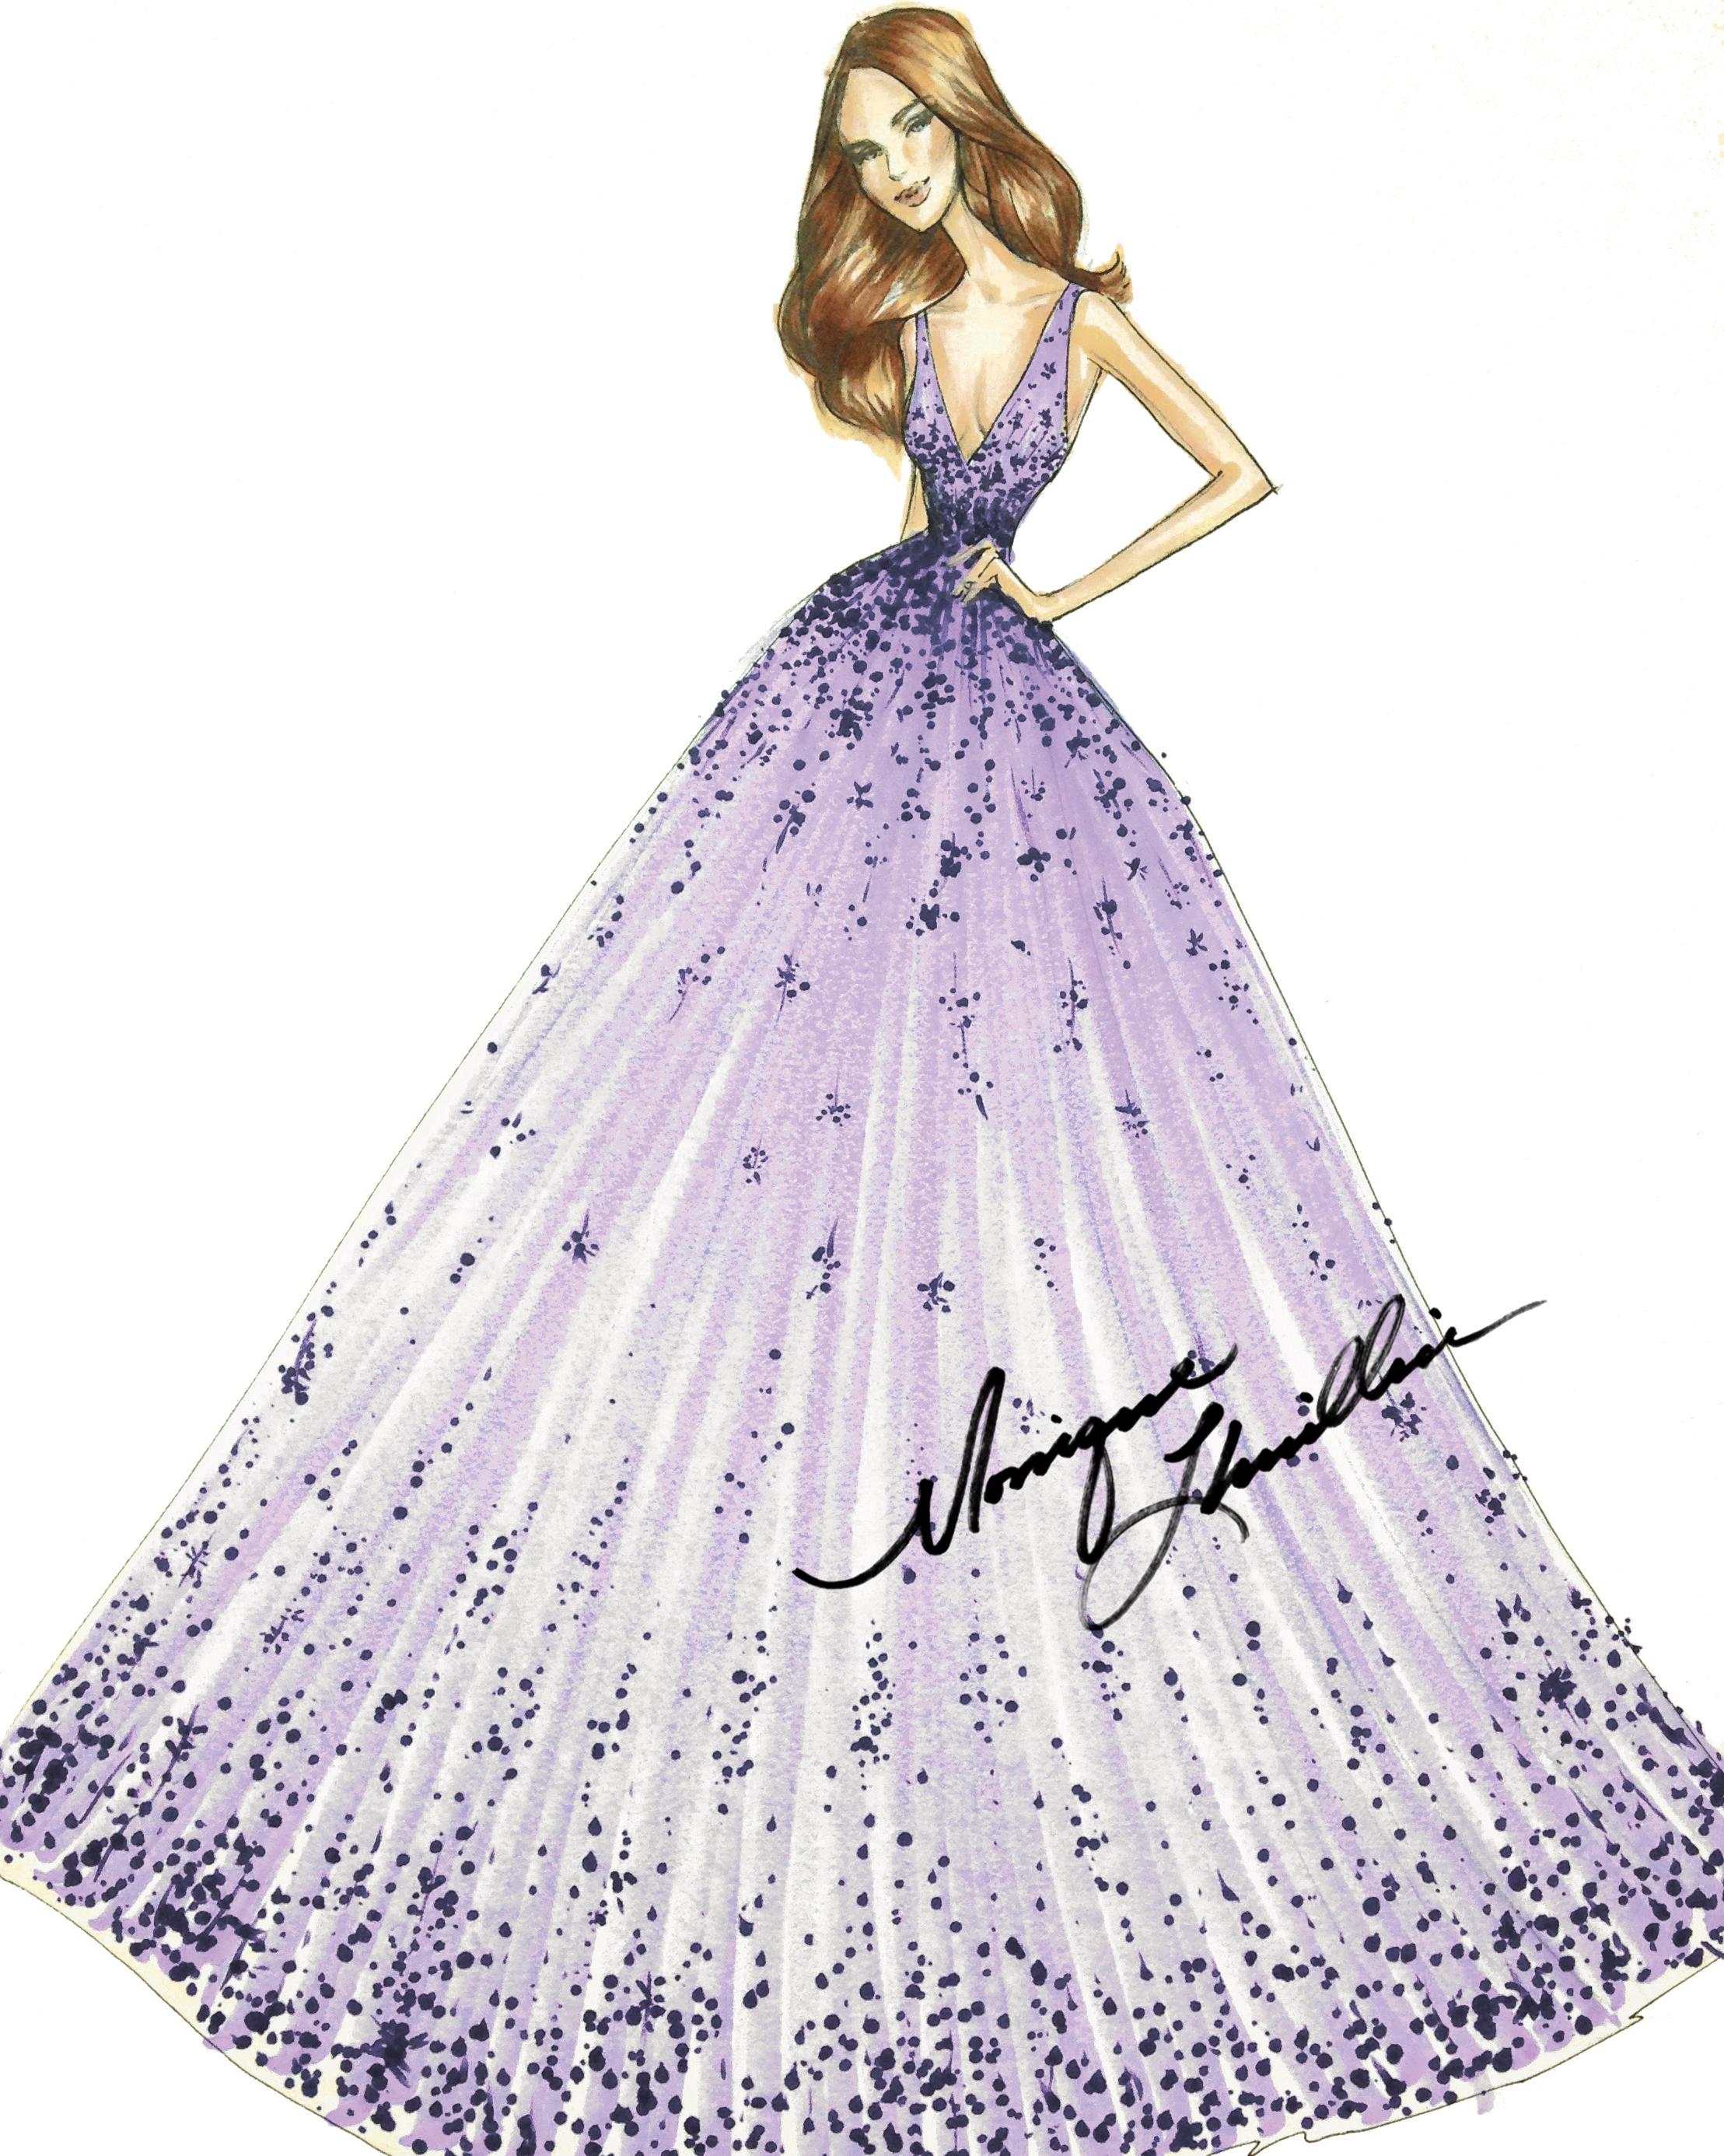 sofia-vergara-dress-sketches-monique-lhuillier-0915.jpg